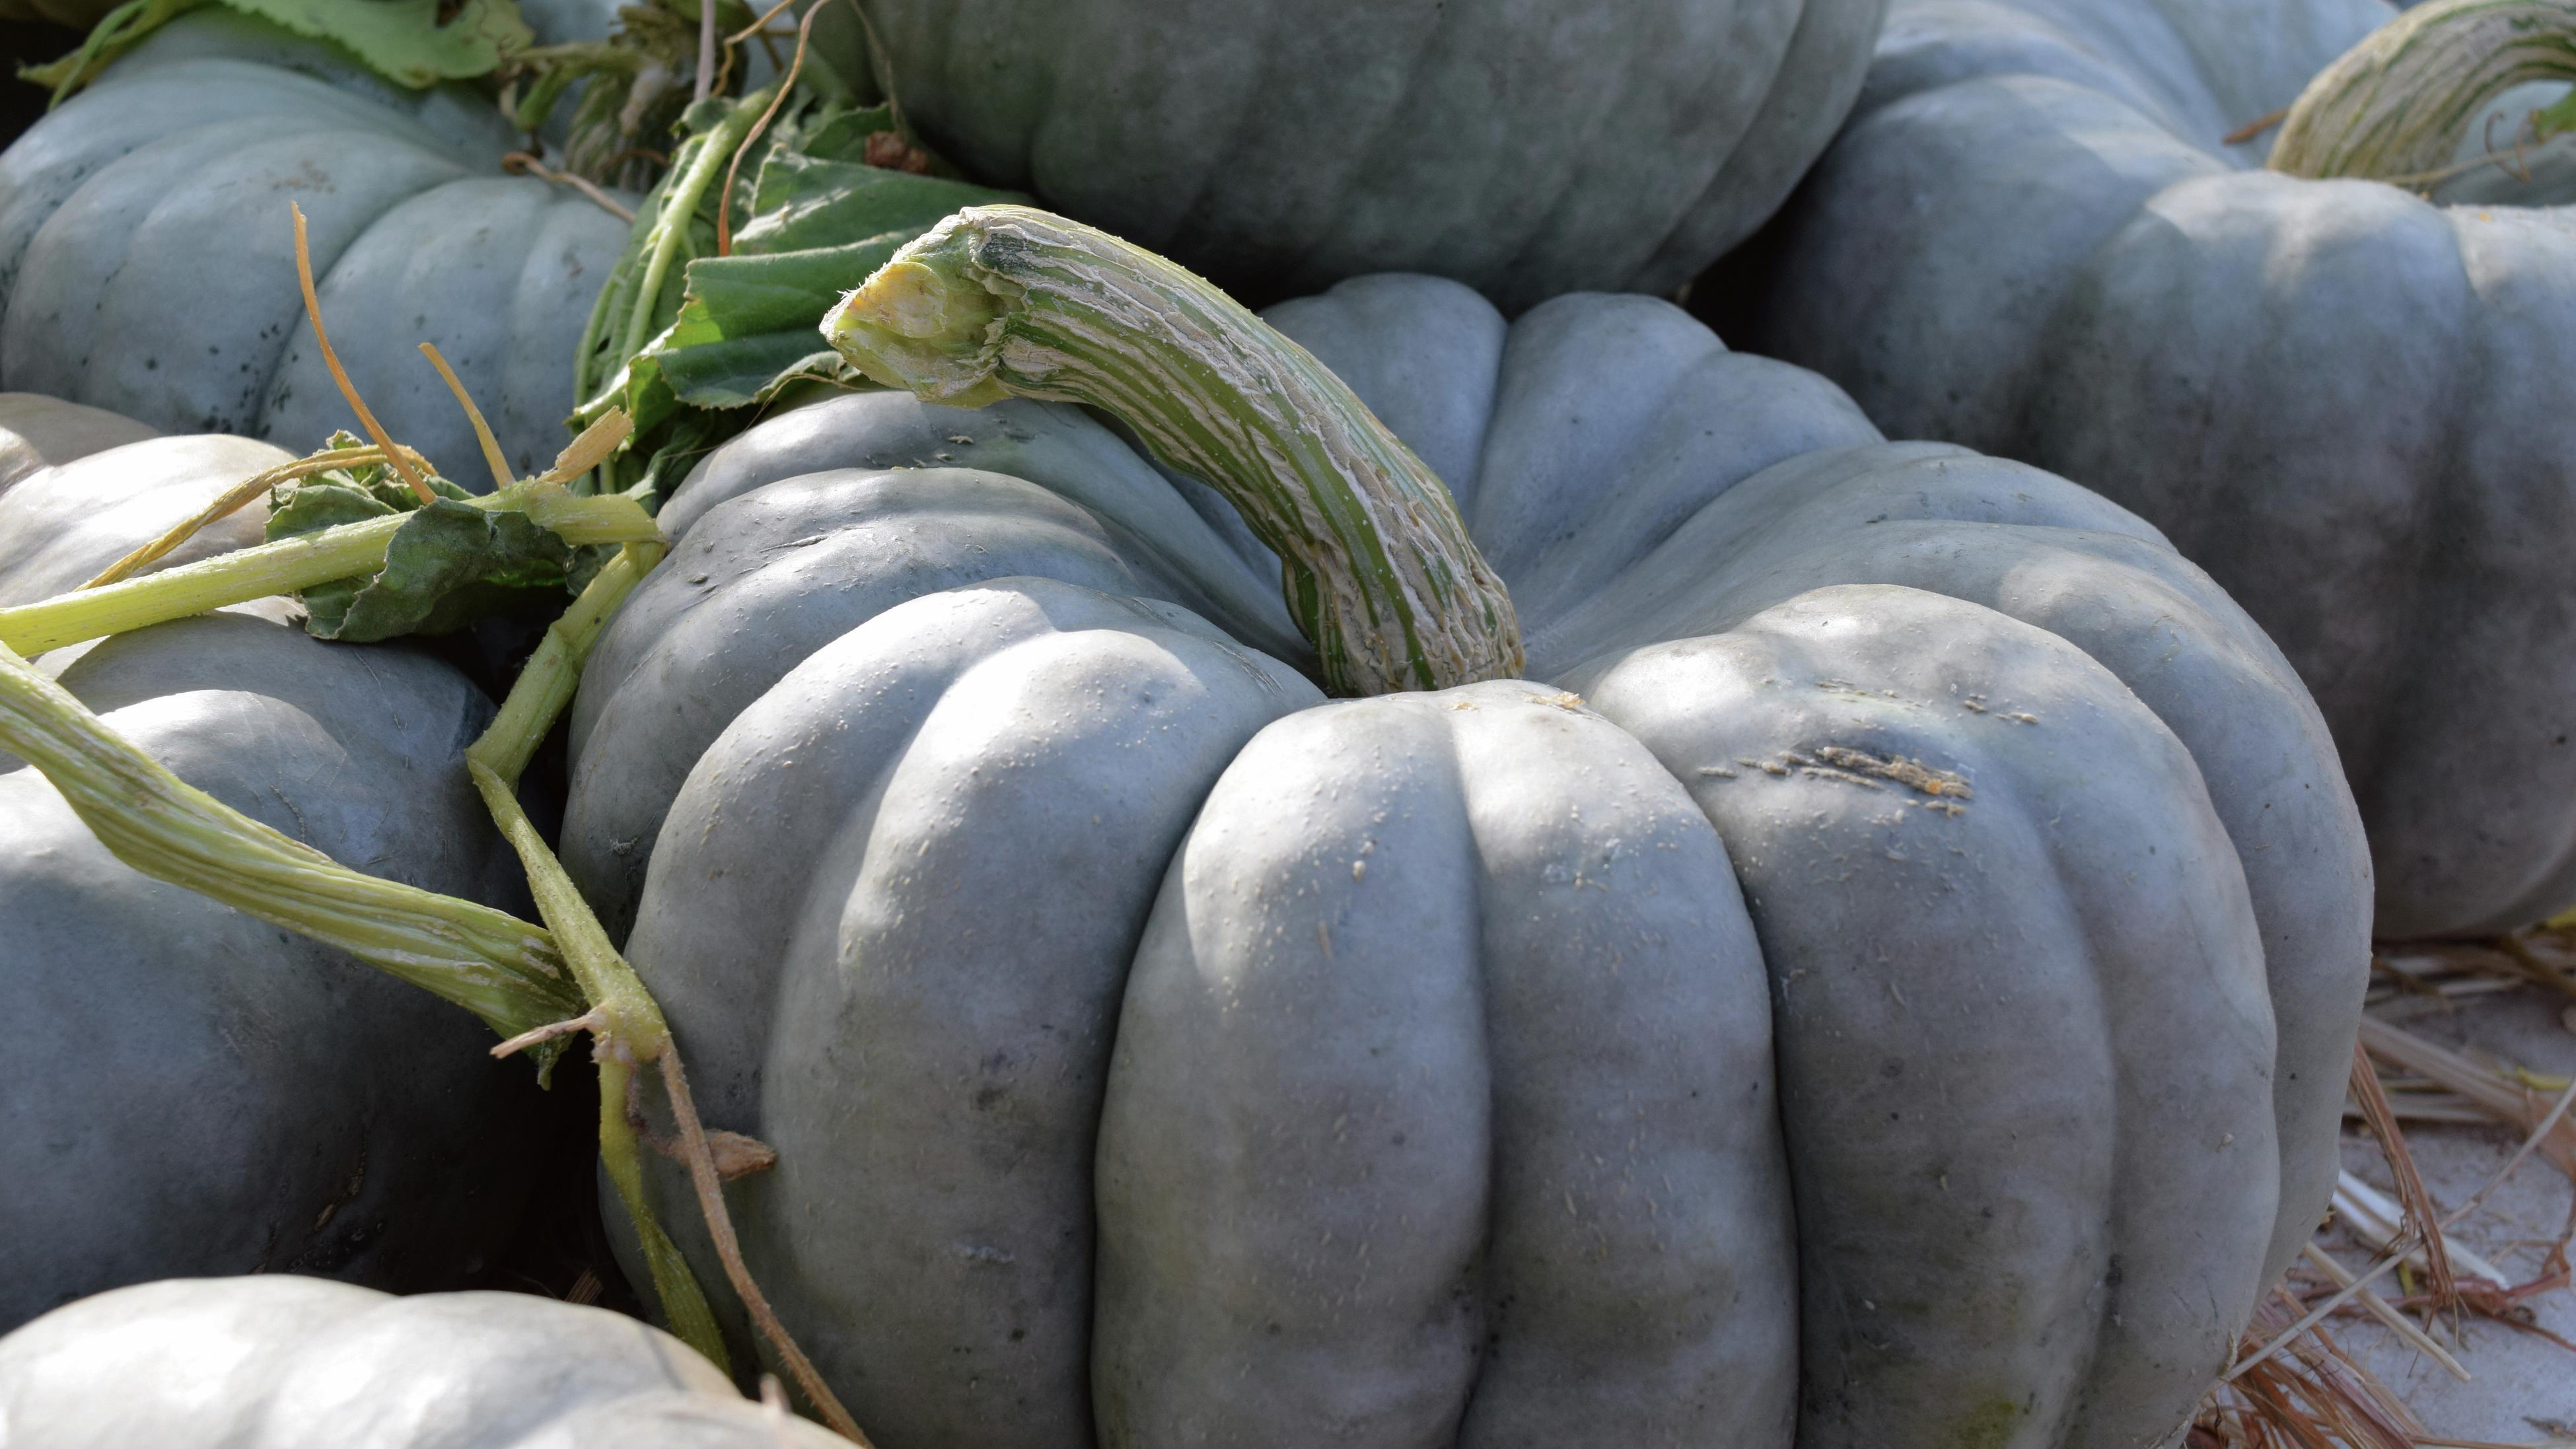 Green pumpkins on display